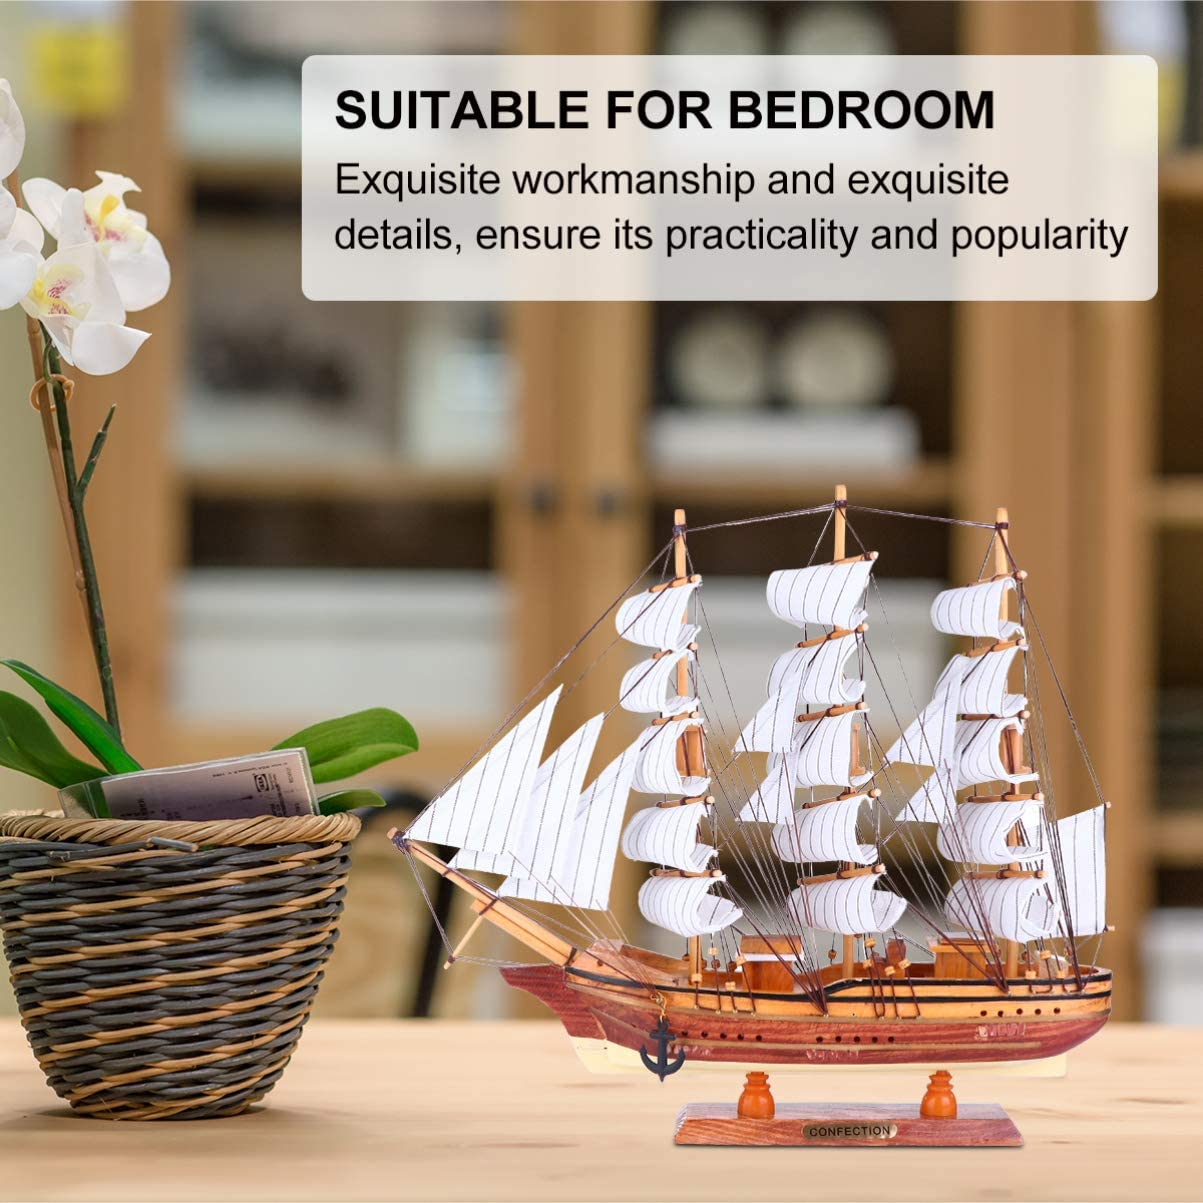 WINOMO Sailing Boat Model Wooden Sailing Ship Model Decor Handmade Vintage Nautical Sail Ship Tabletop Ornament Photo Props for Home Decor